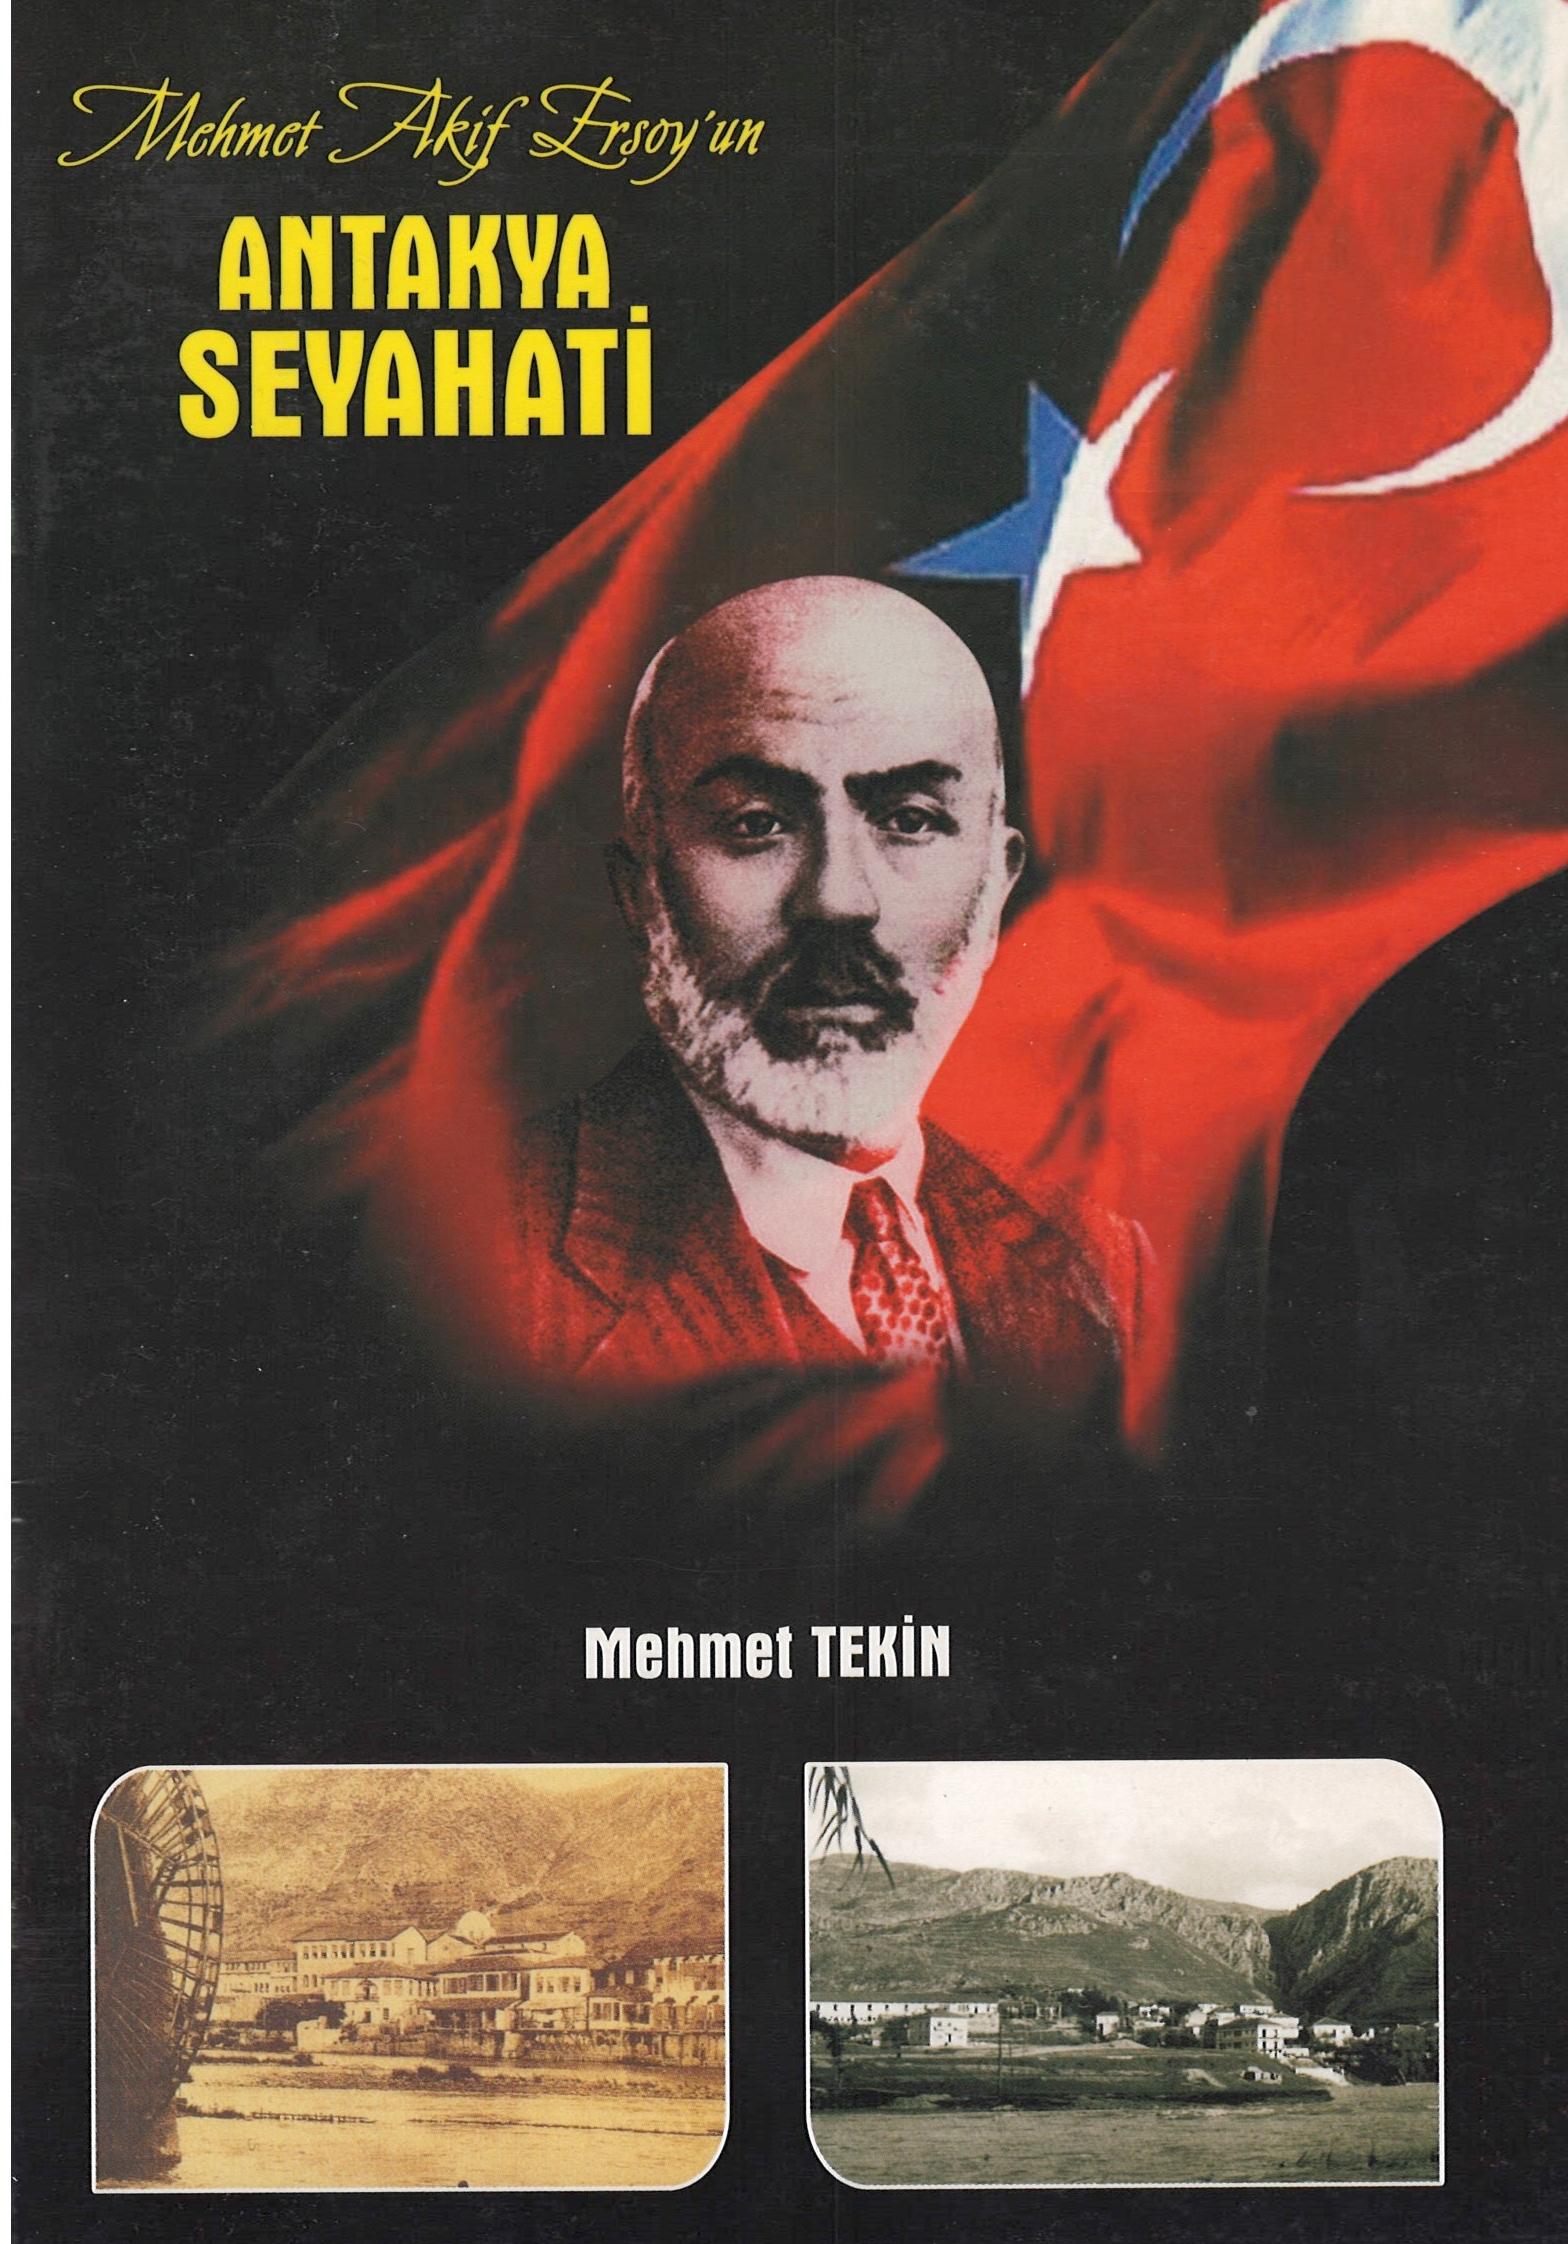 Seyahat(name)lerdeki Antakya – 10, Mehmet Akif Ersoy